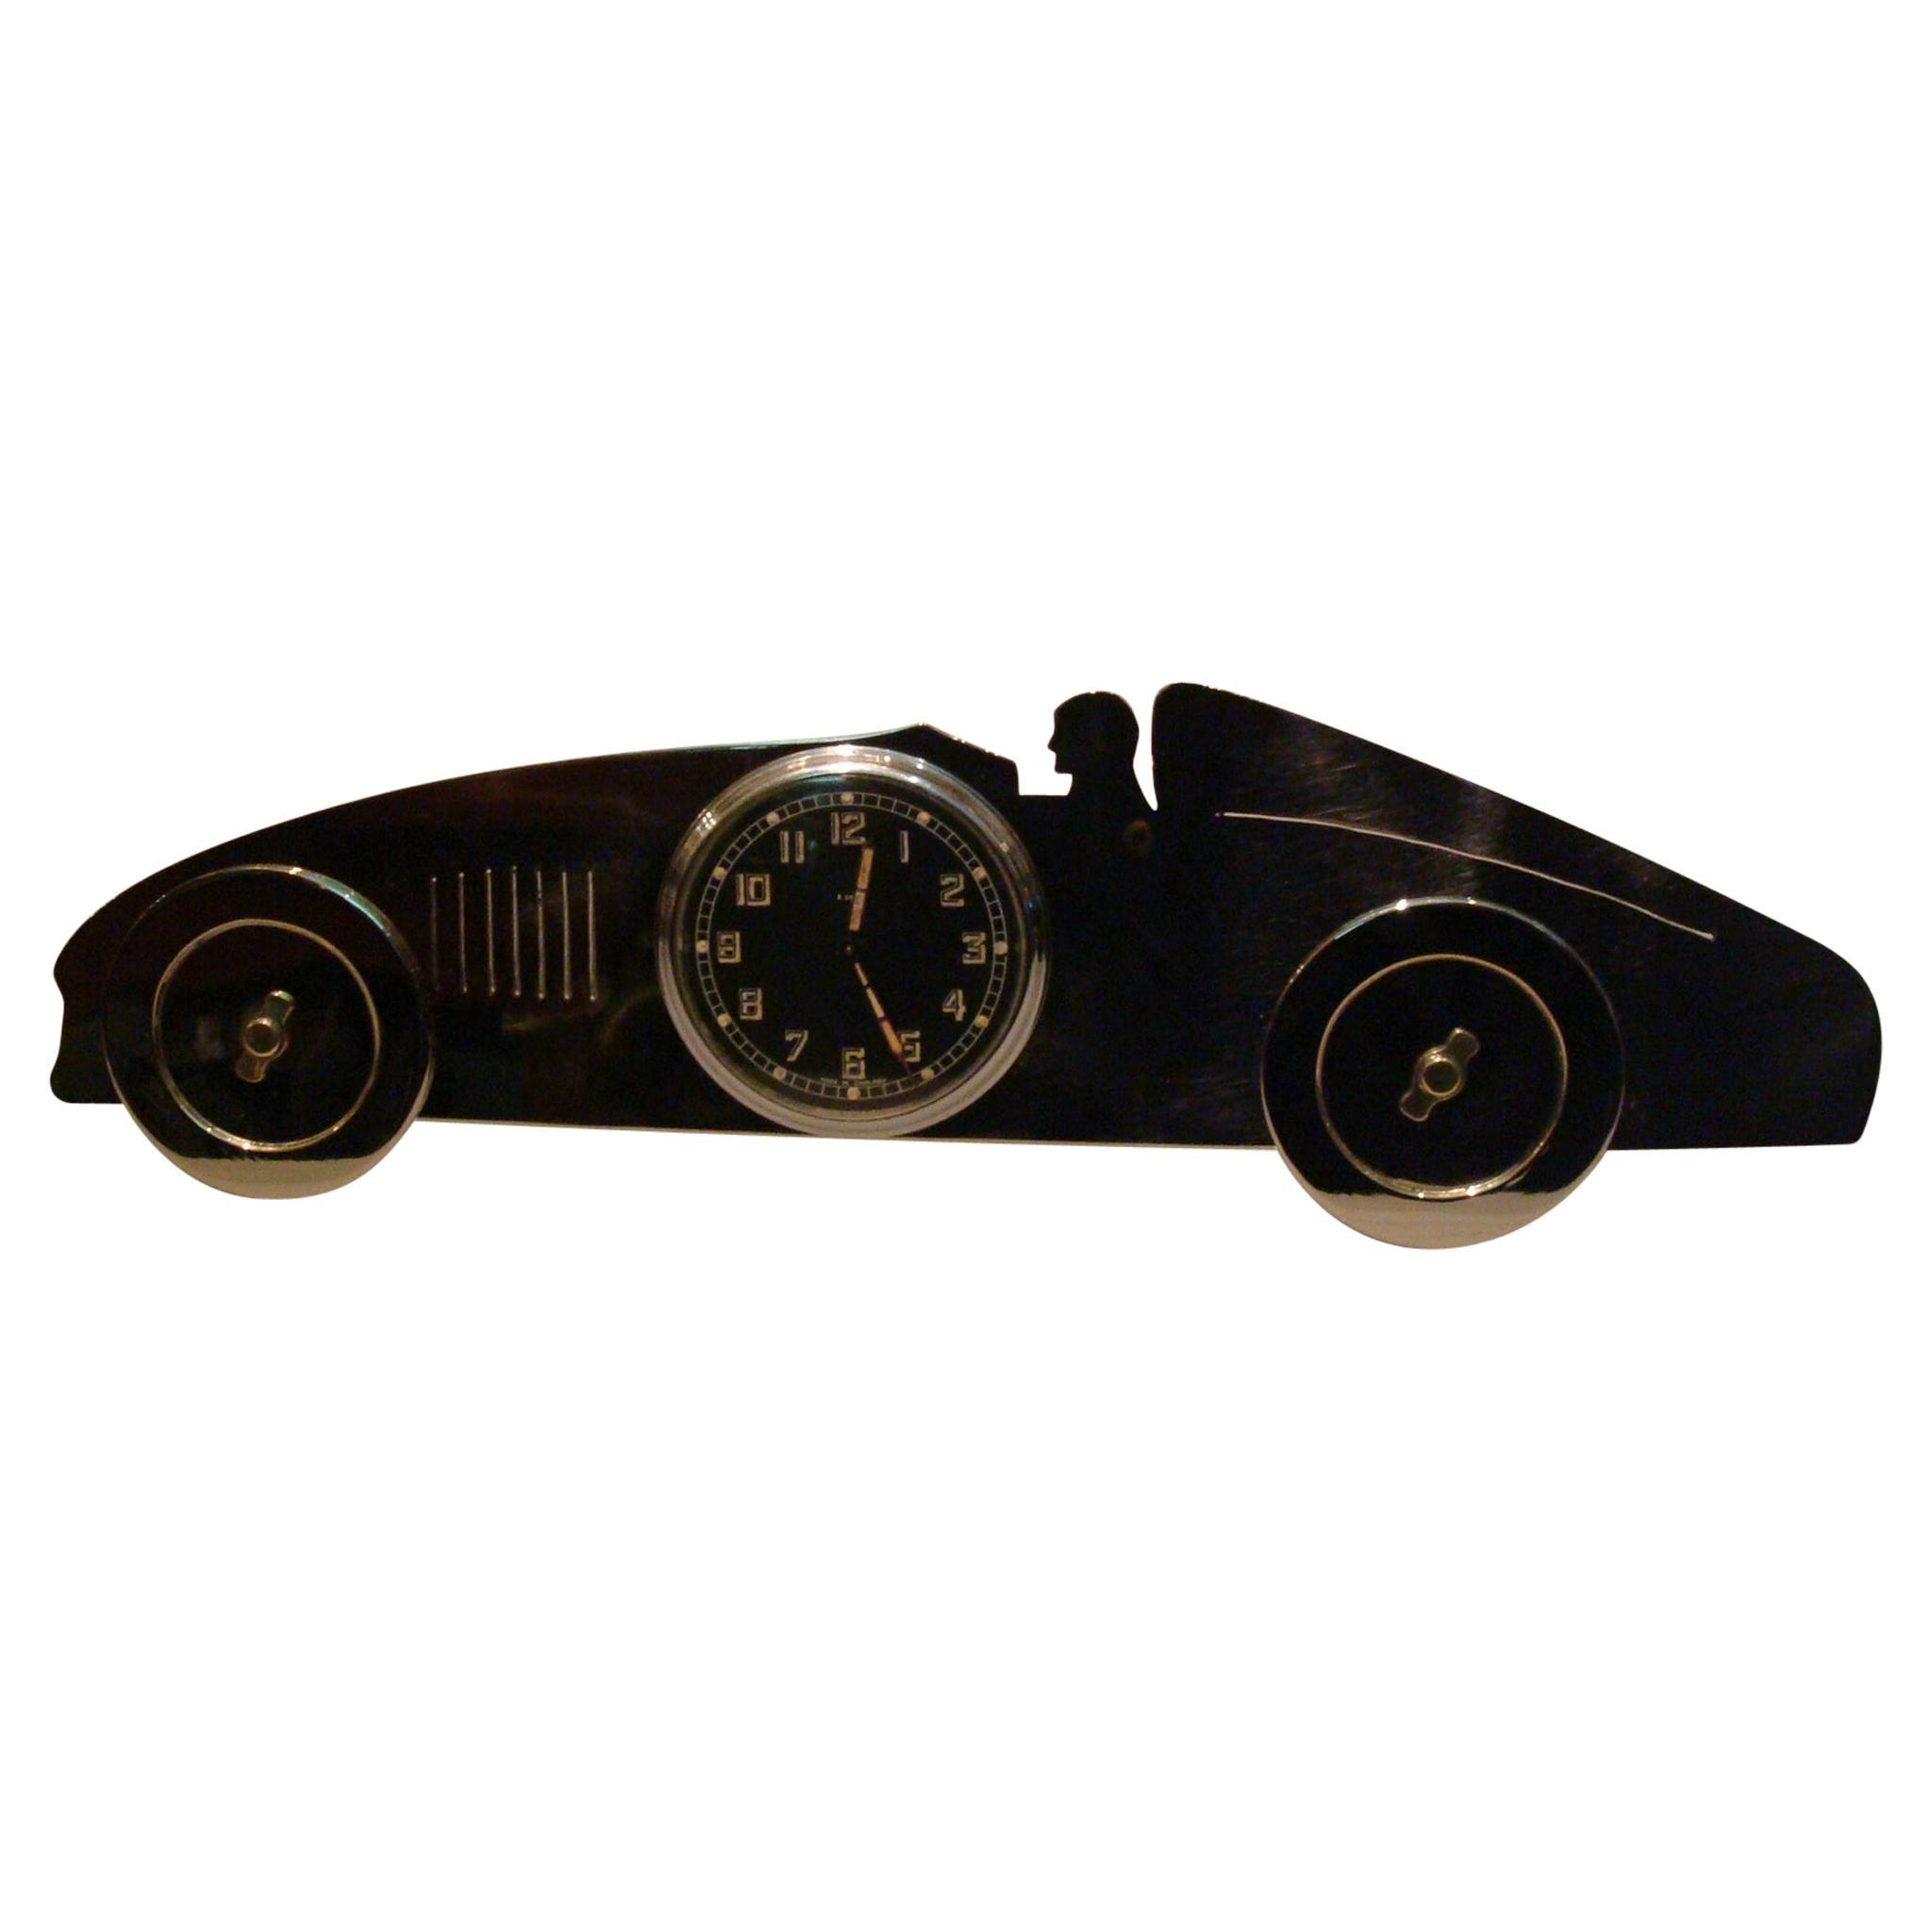 Art Deco Racing Car Desk Clock / Automobilia / U.K., 1920s